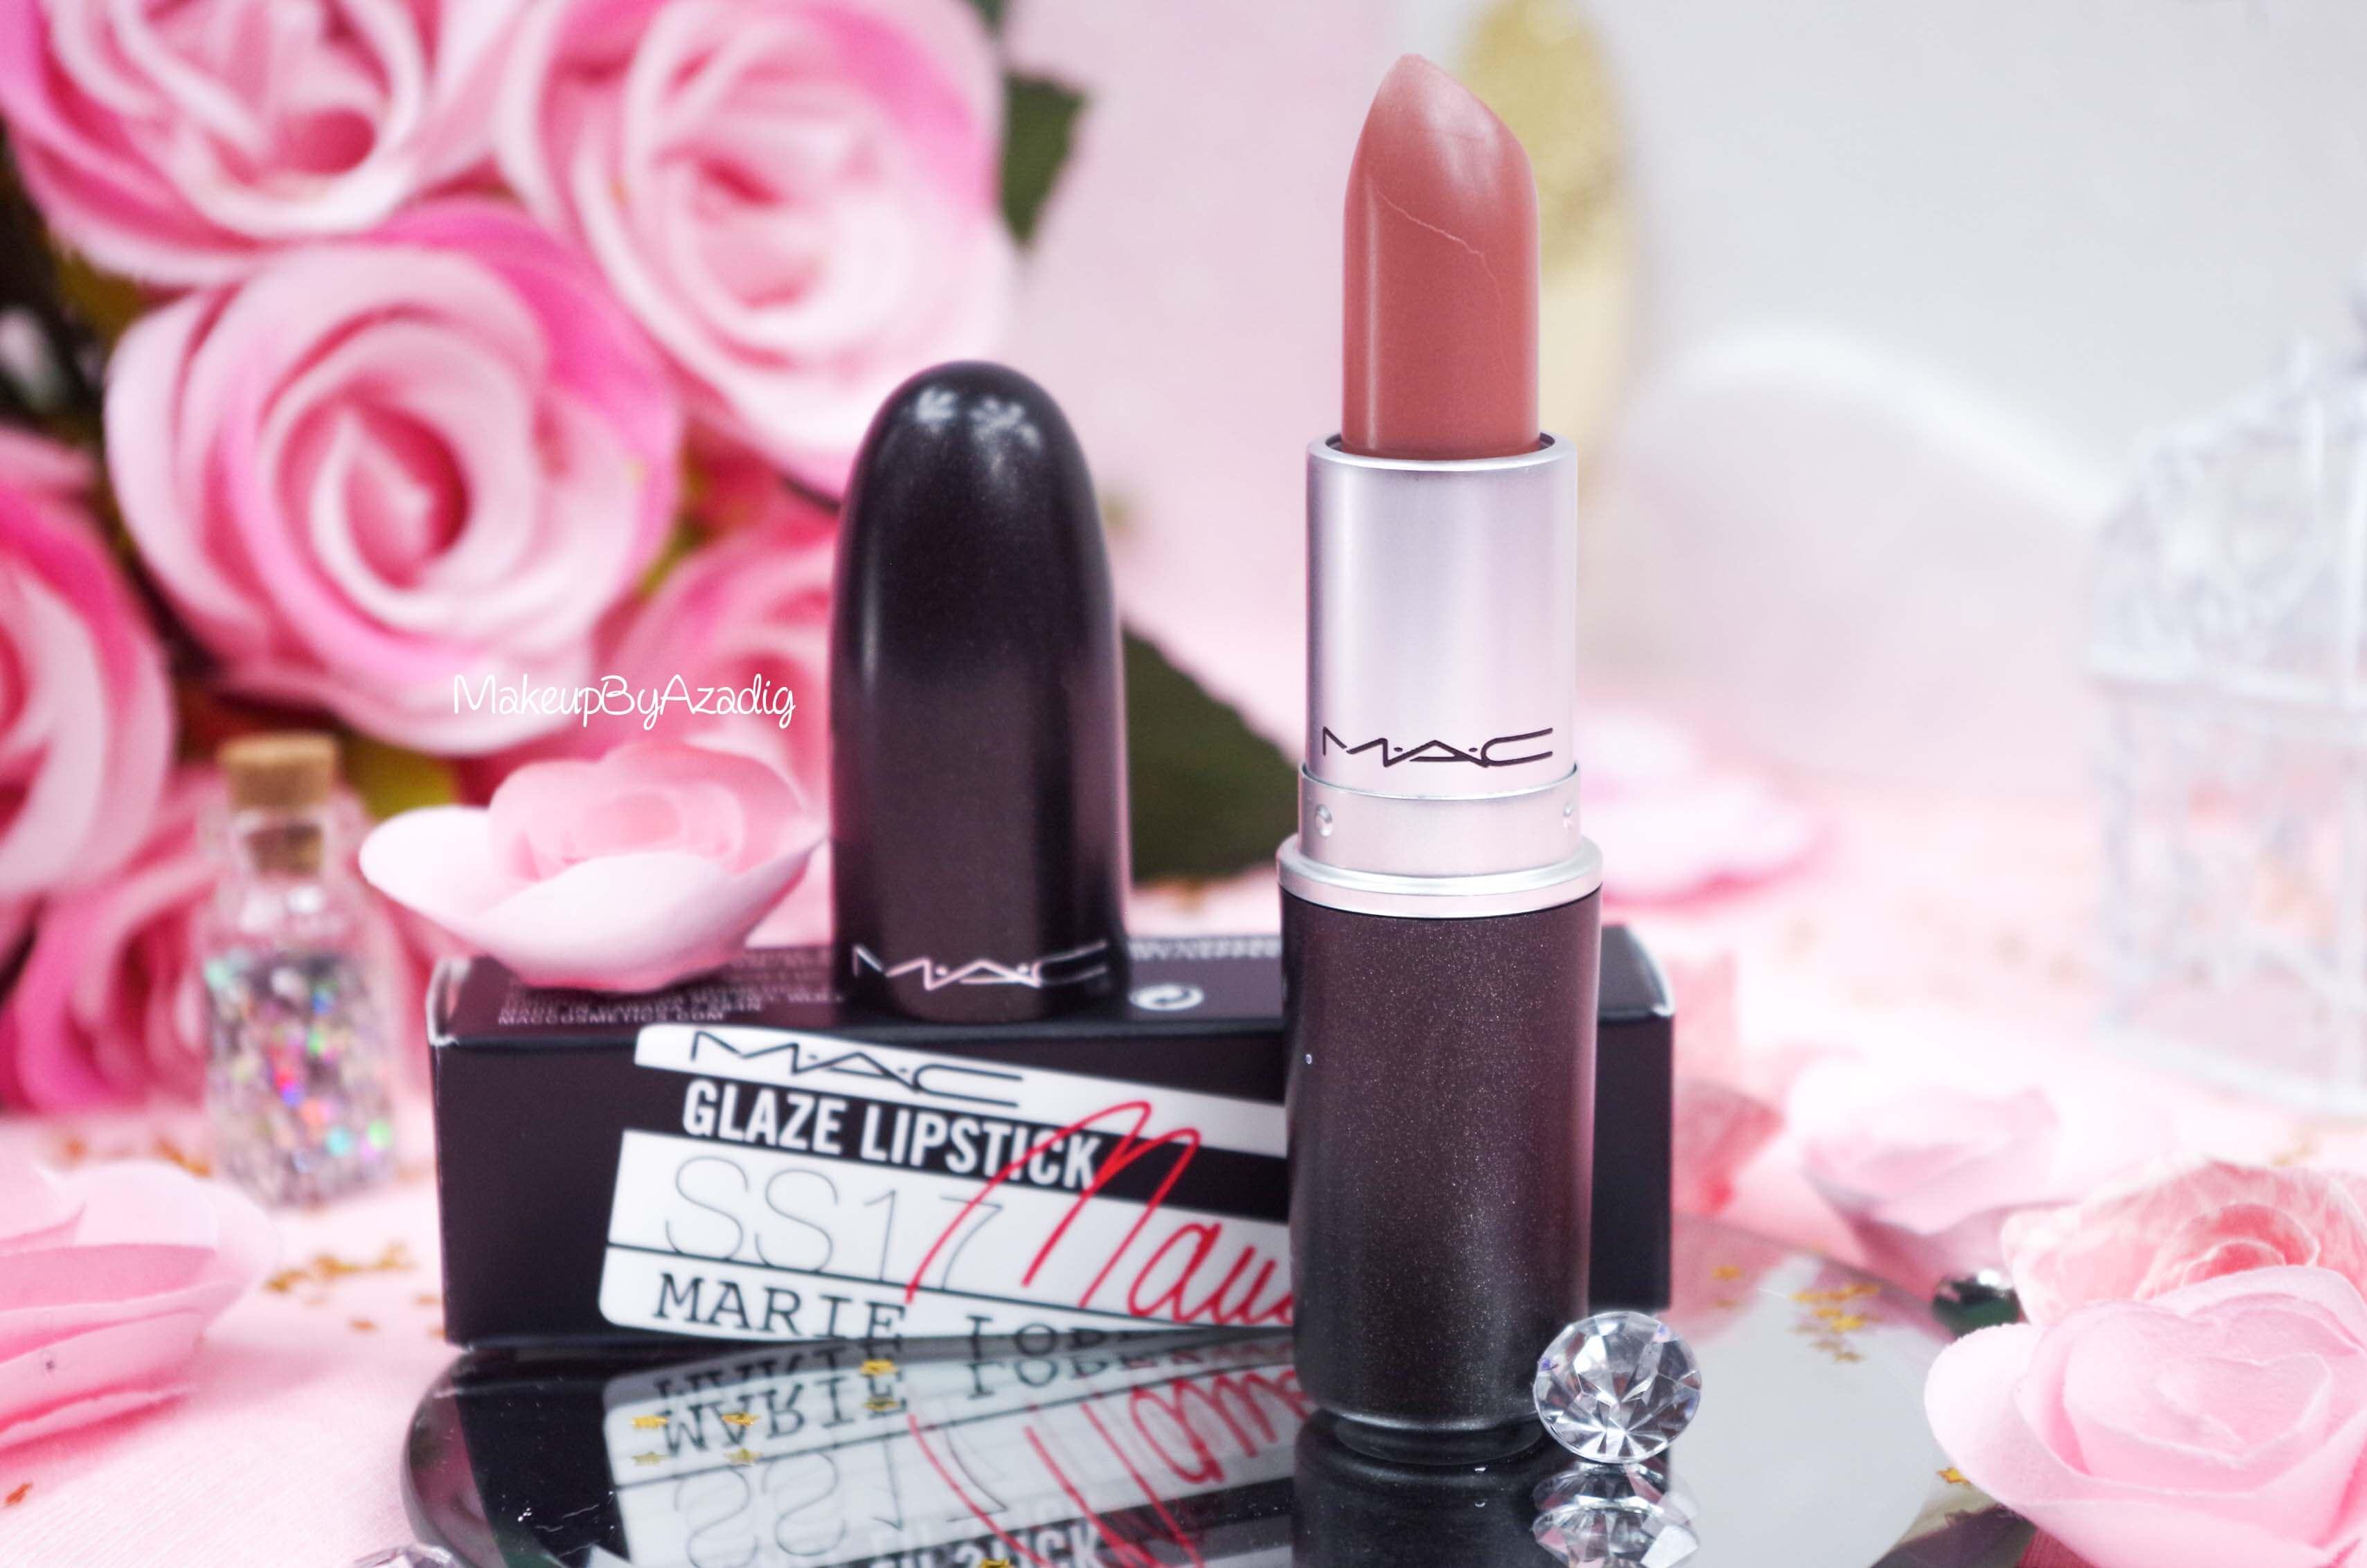 miniature-macxmarie-mac-cosmetics-rouge-a-levres-enjoy-phoenix-collaboration-makeupbyazadig-revue-avis-prix-meetup